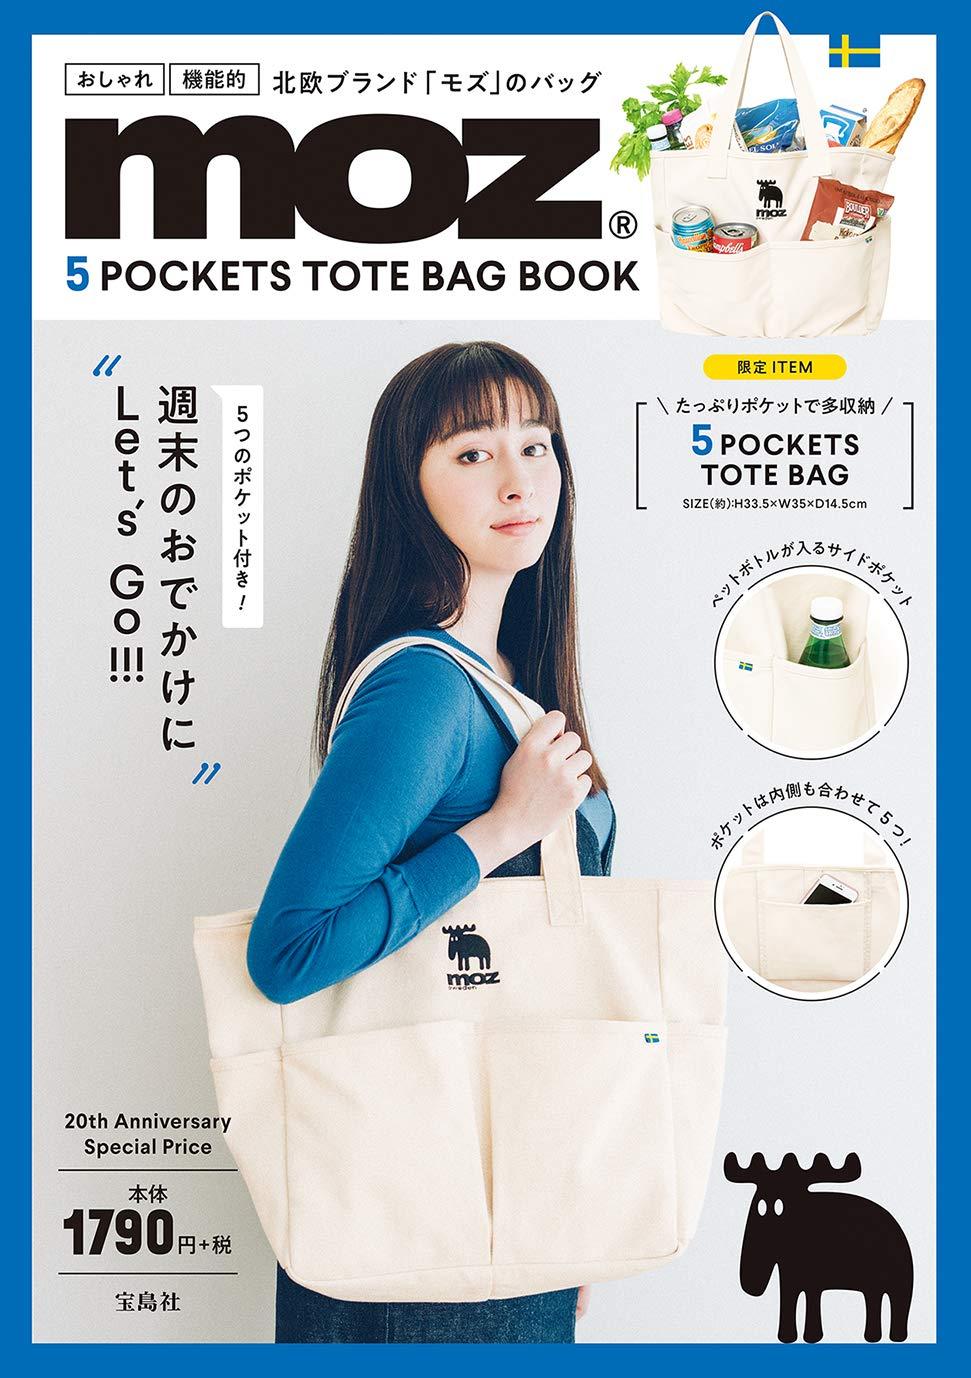 moz 5 POCKETS TOTE BAG BOOK (バラエティ)